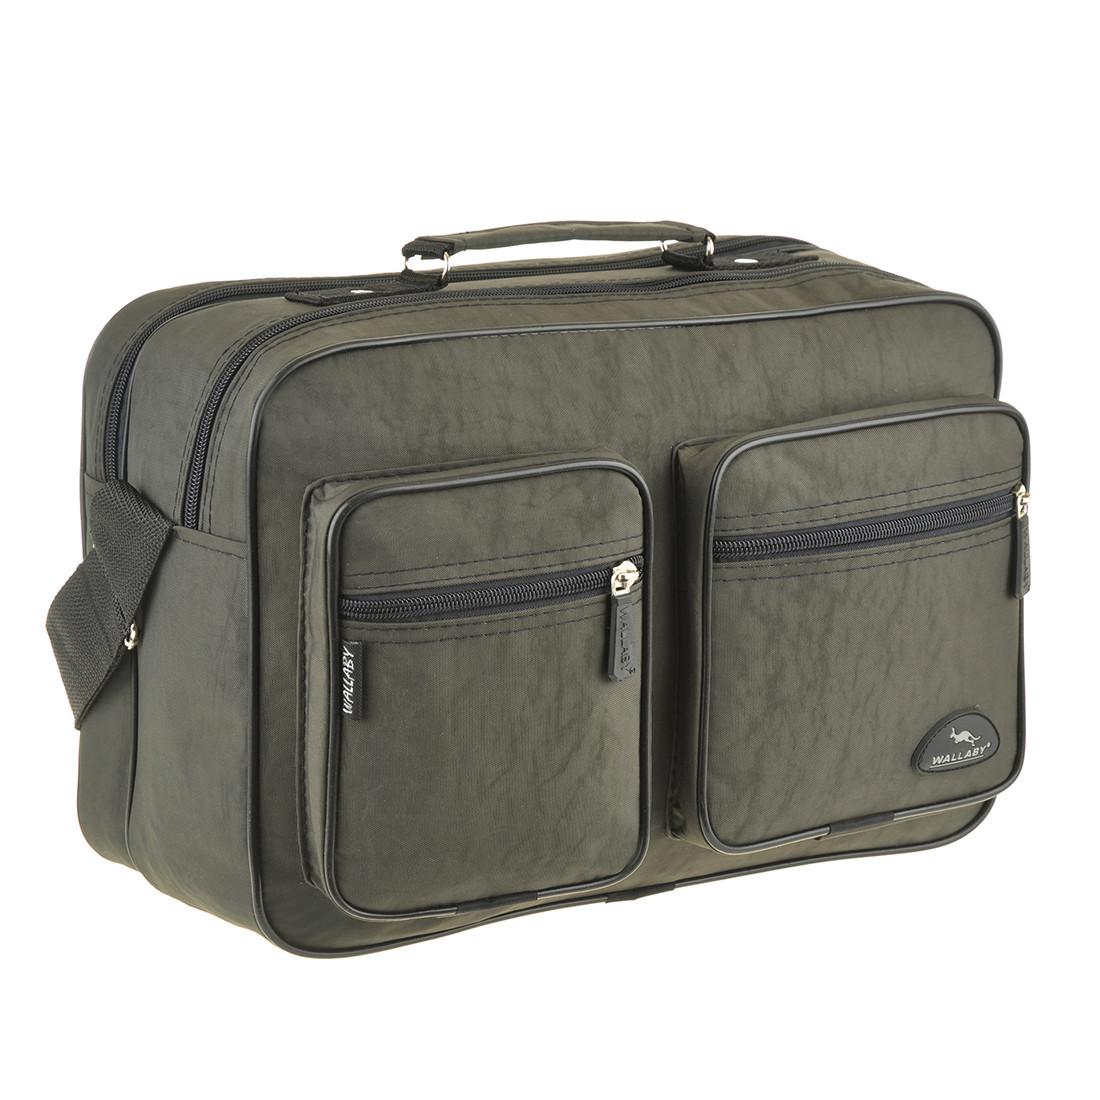 Мужская сумка Wallaby 35х24х14 ткань кринкл, 2 отделения  в 2647х